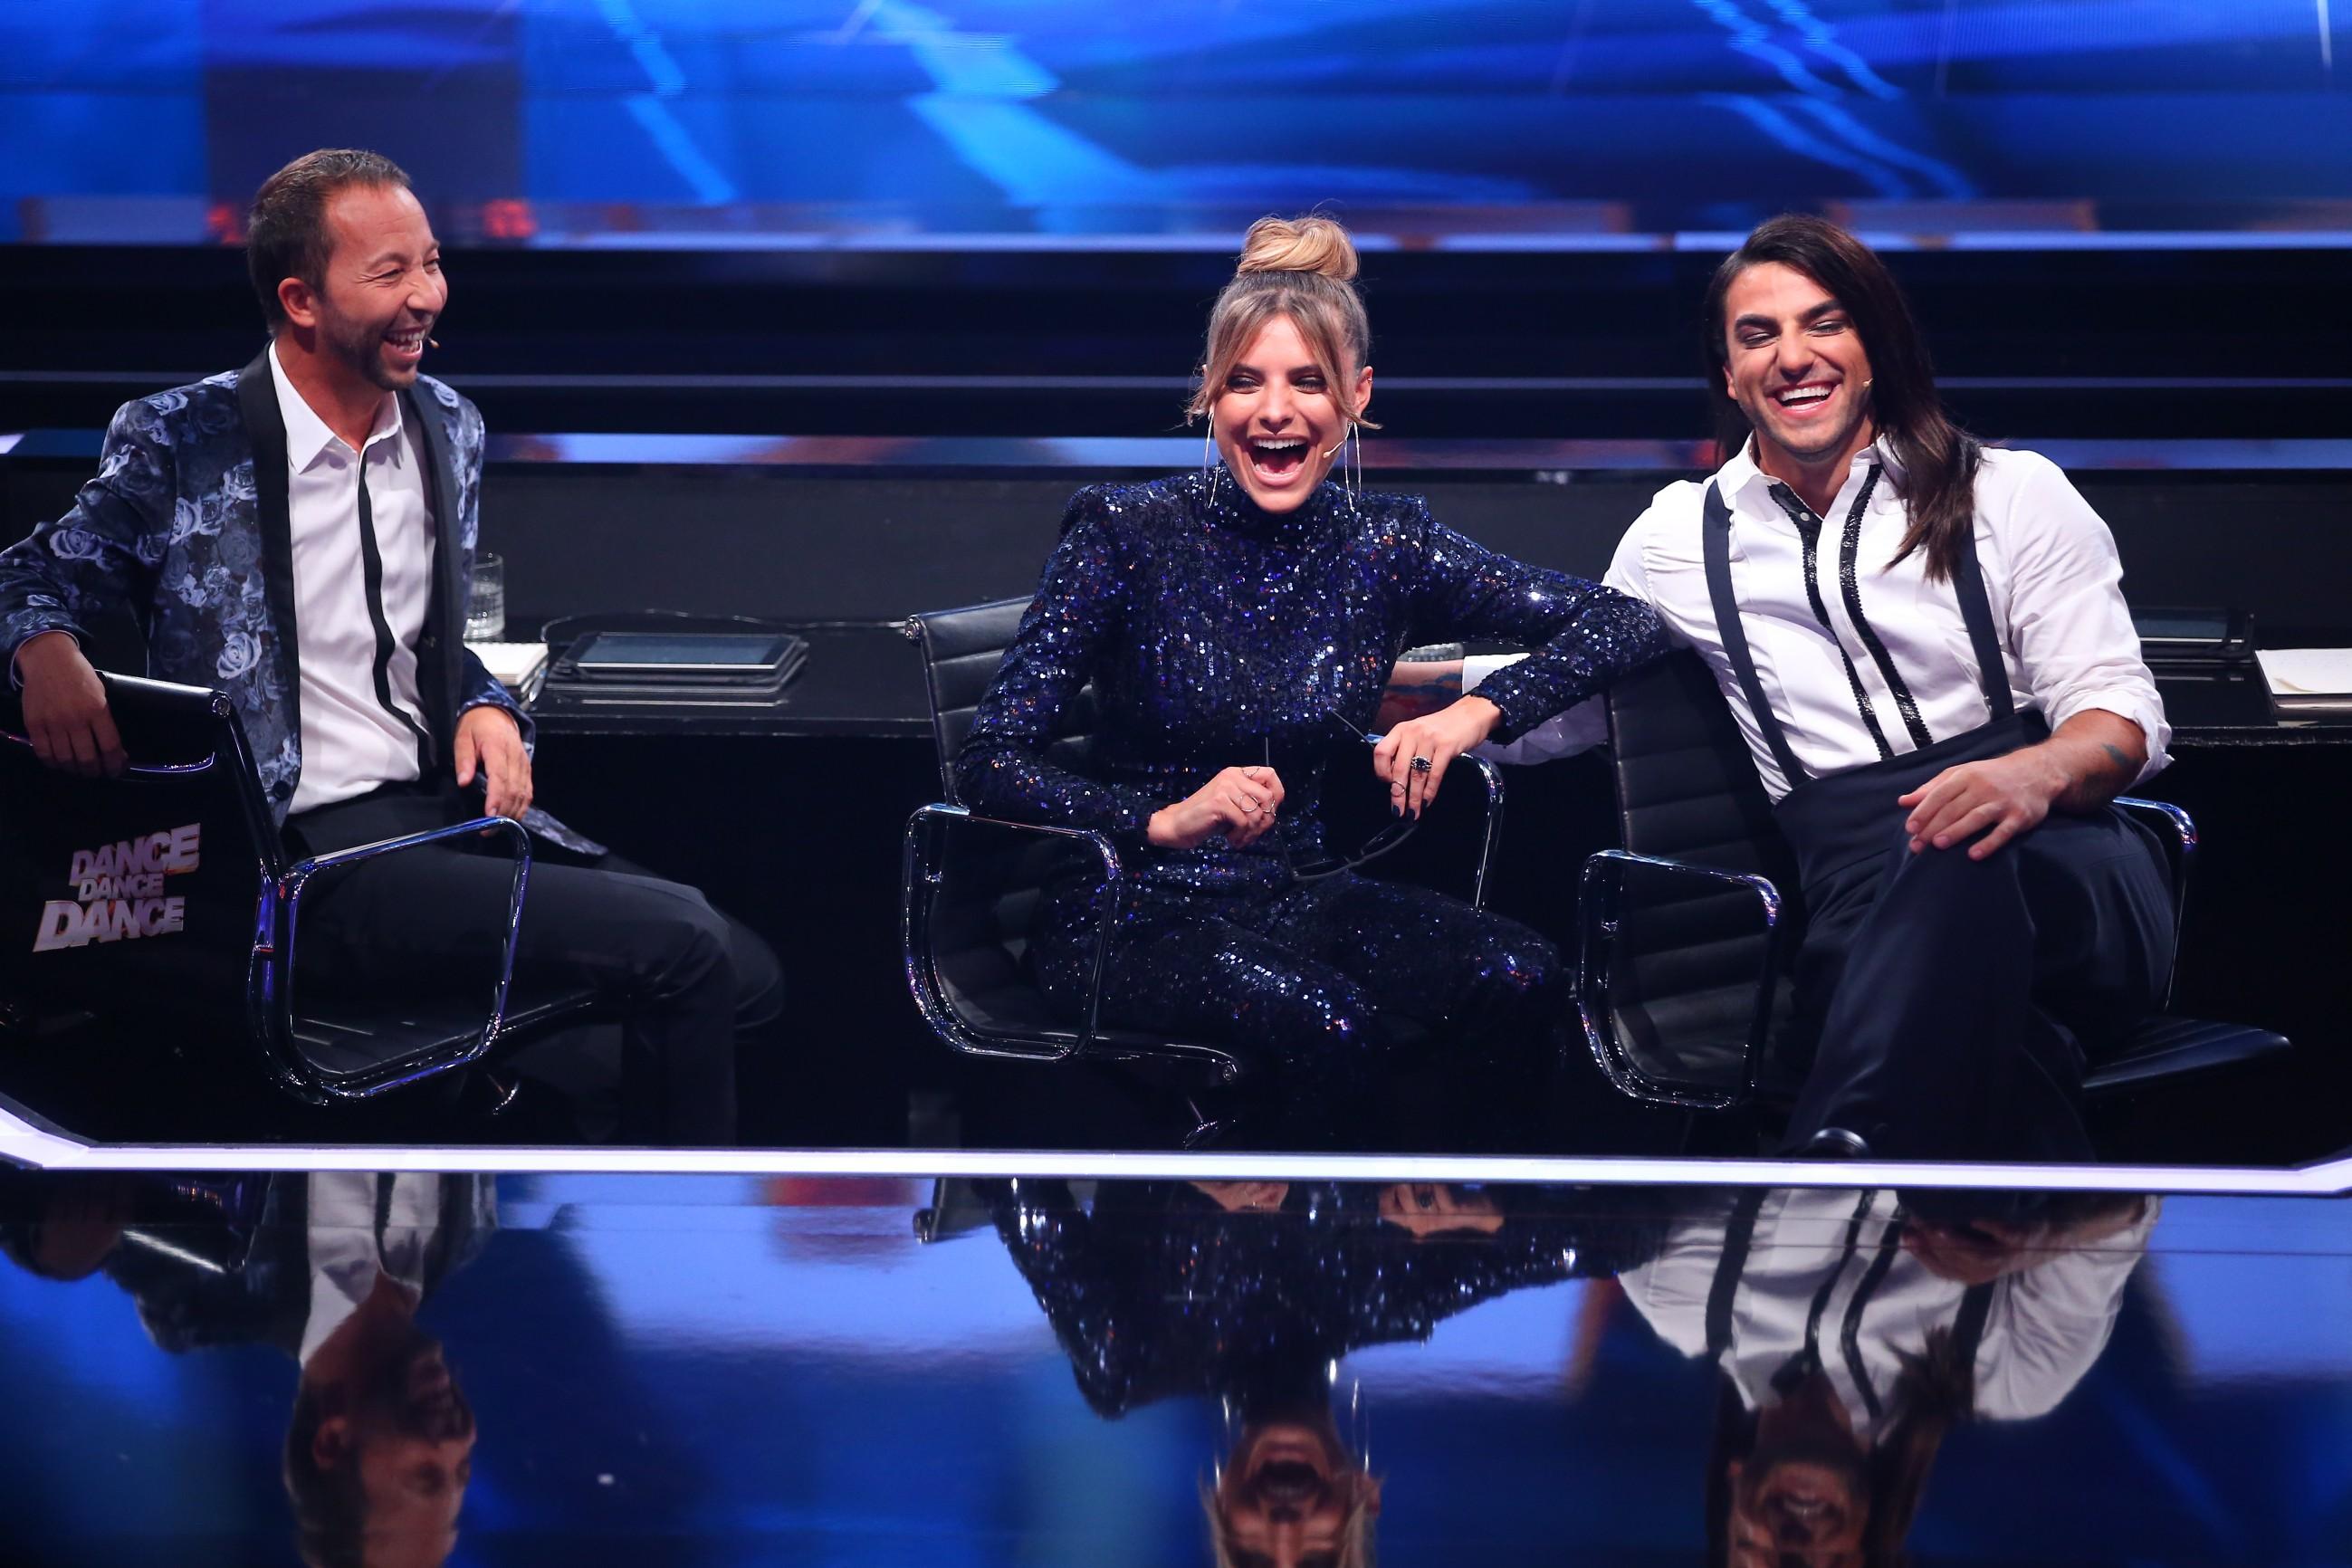 Dance Dance Dance Halbfinale - ophia Thomalla, DJ BoBo und Cale Kalay